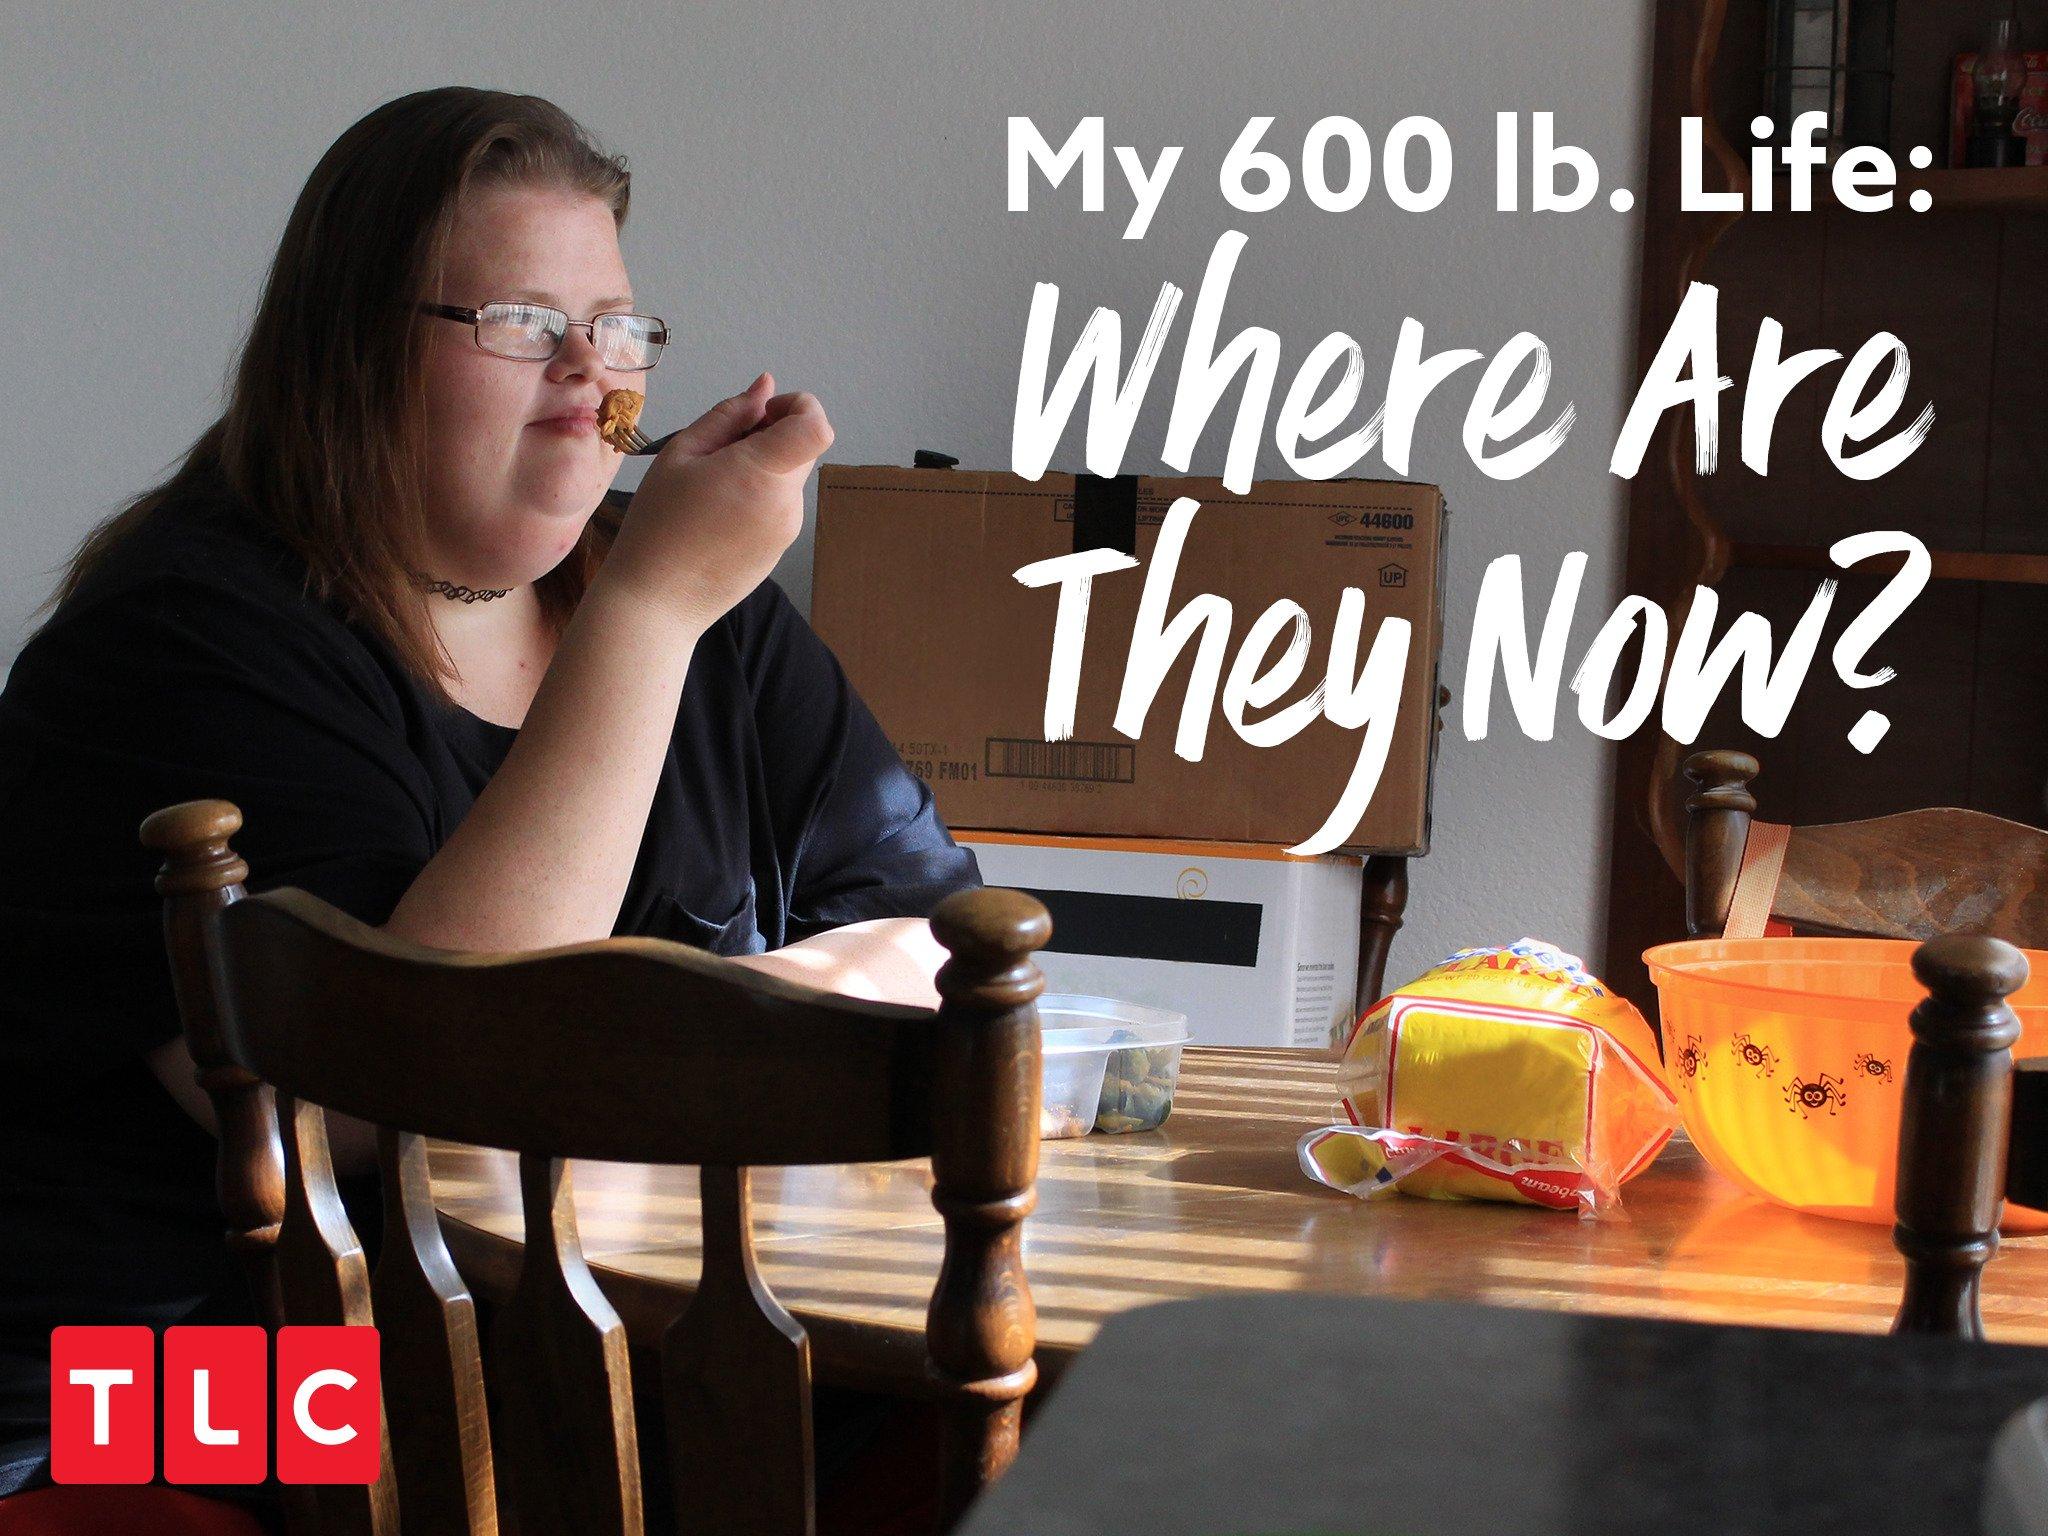 my 600 lb life season 4 episode 9